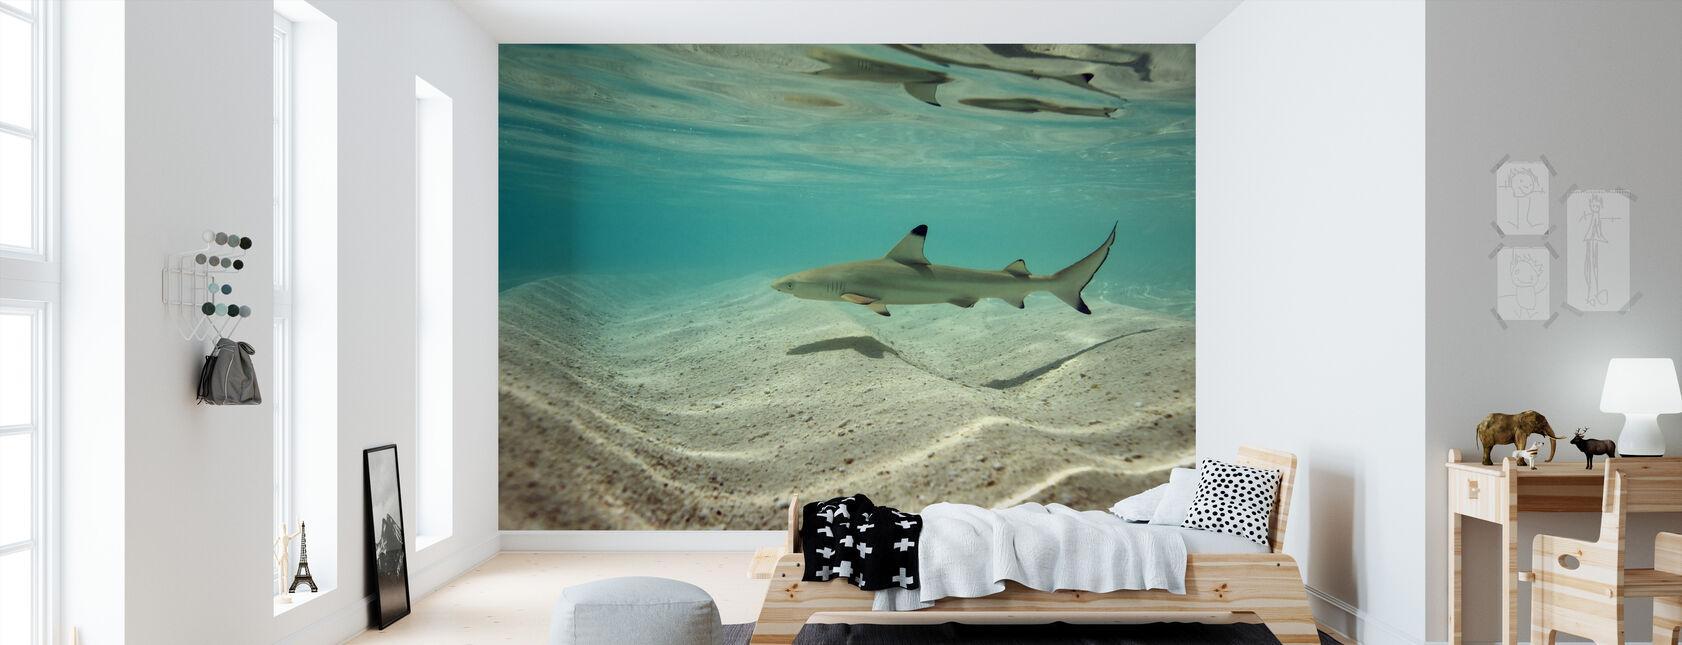 Blacktip Rif Shark - Behang - Kinderkamer